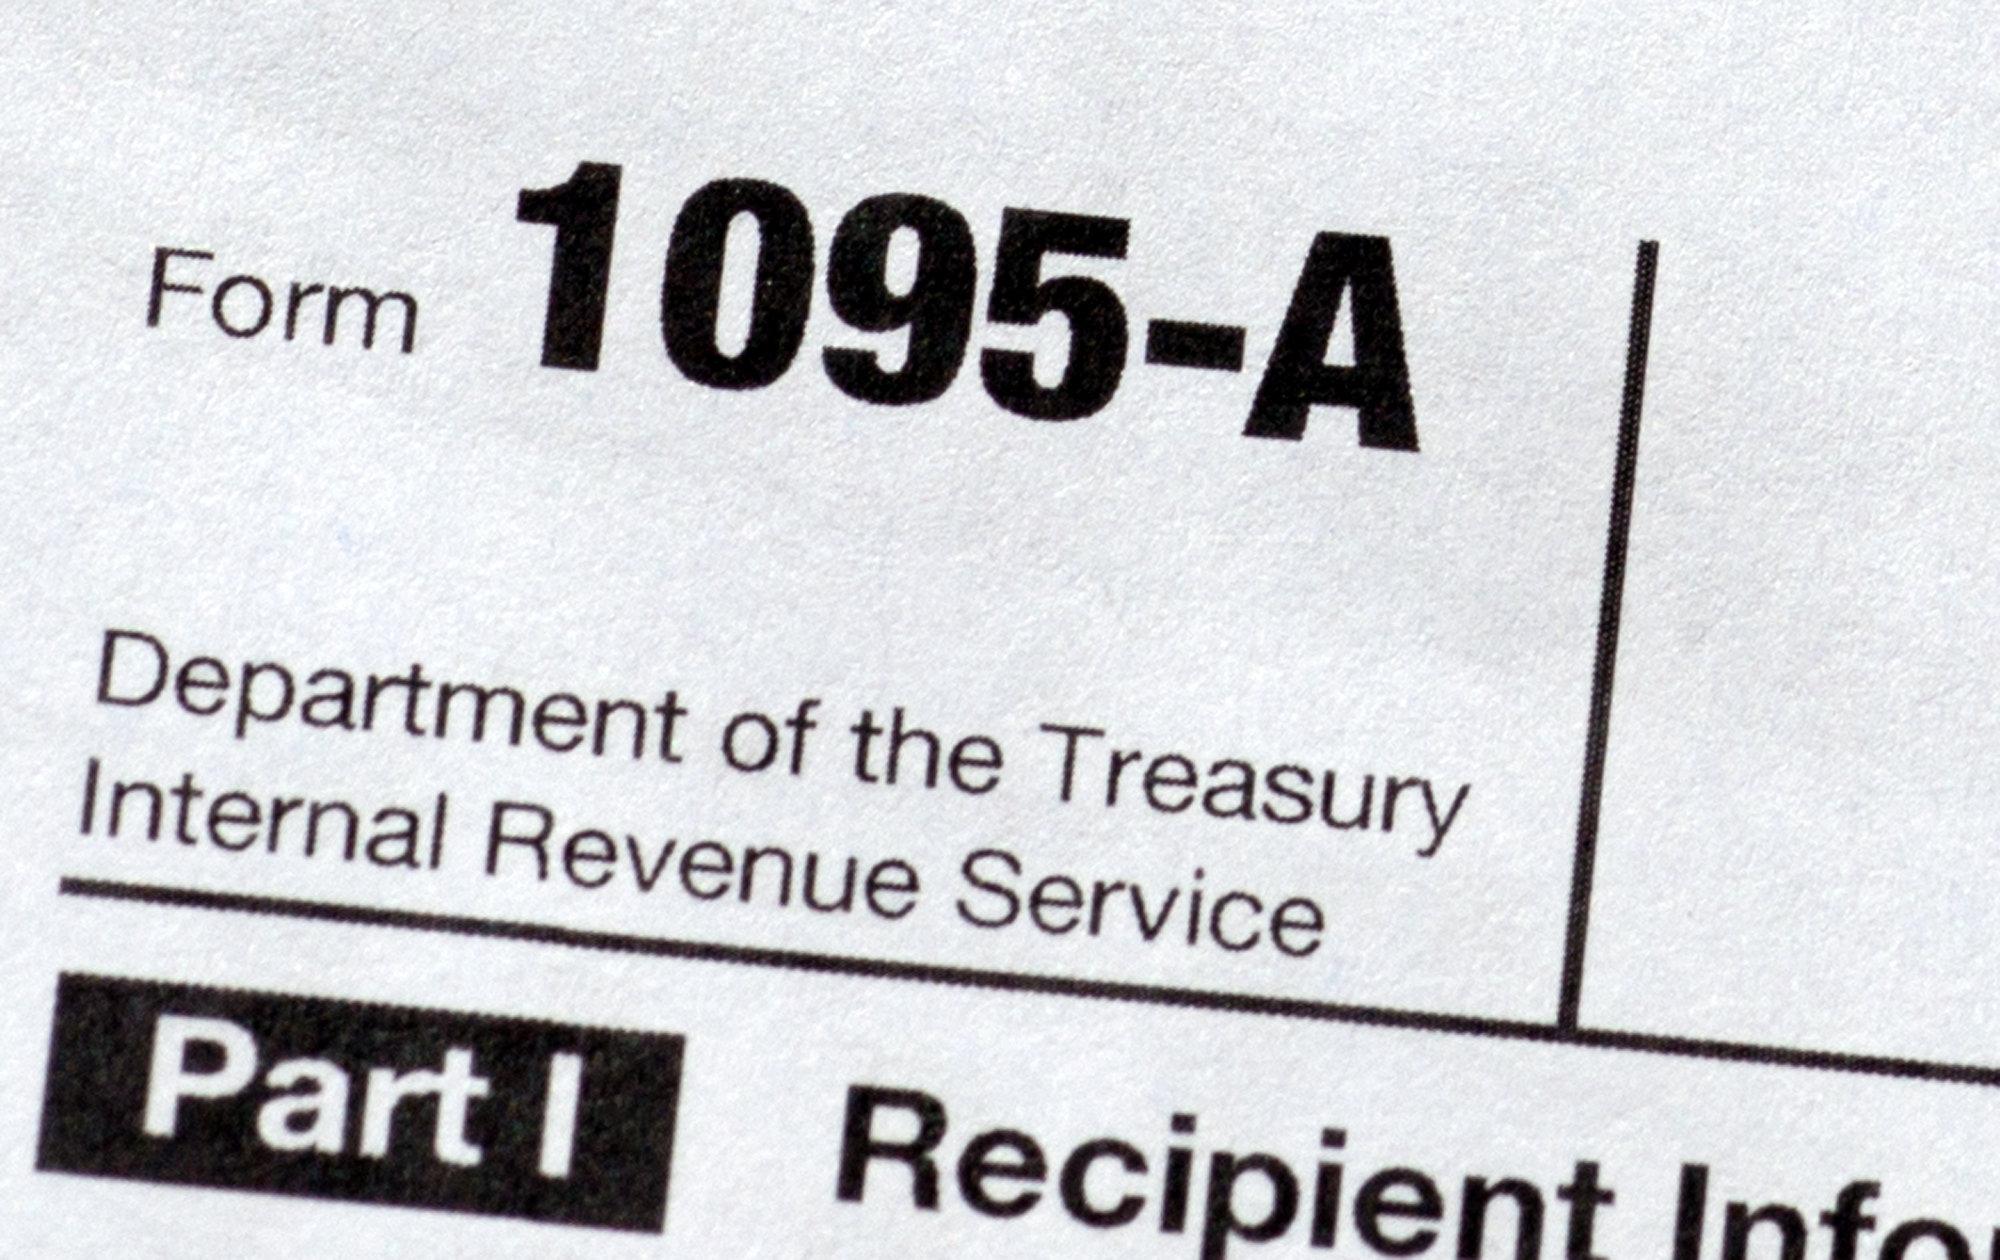 Tax forms could pose challenge for HealthCare.gov | masslive.com